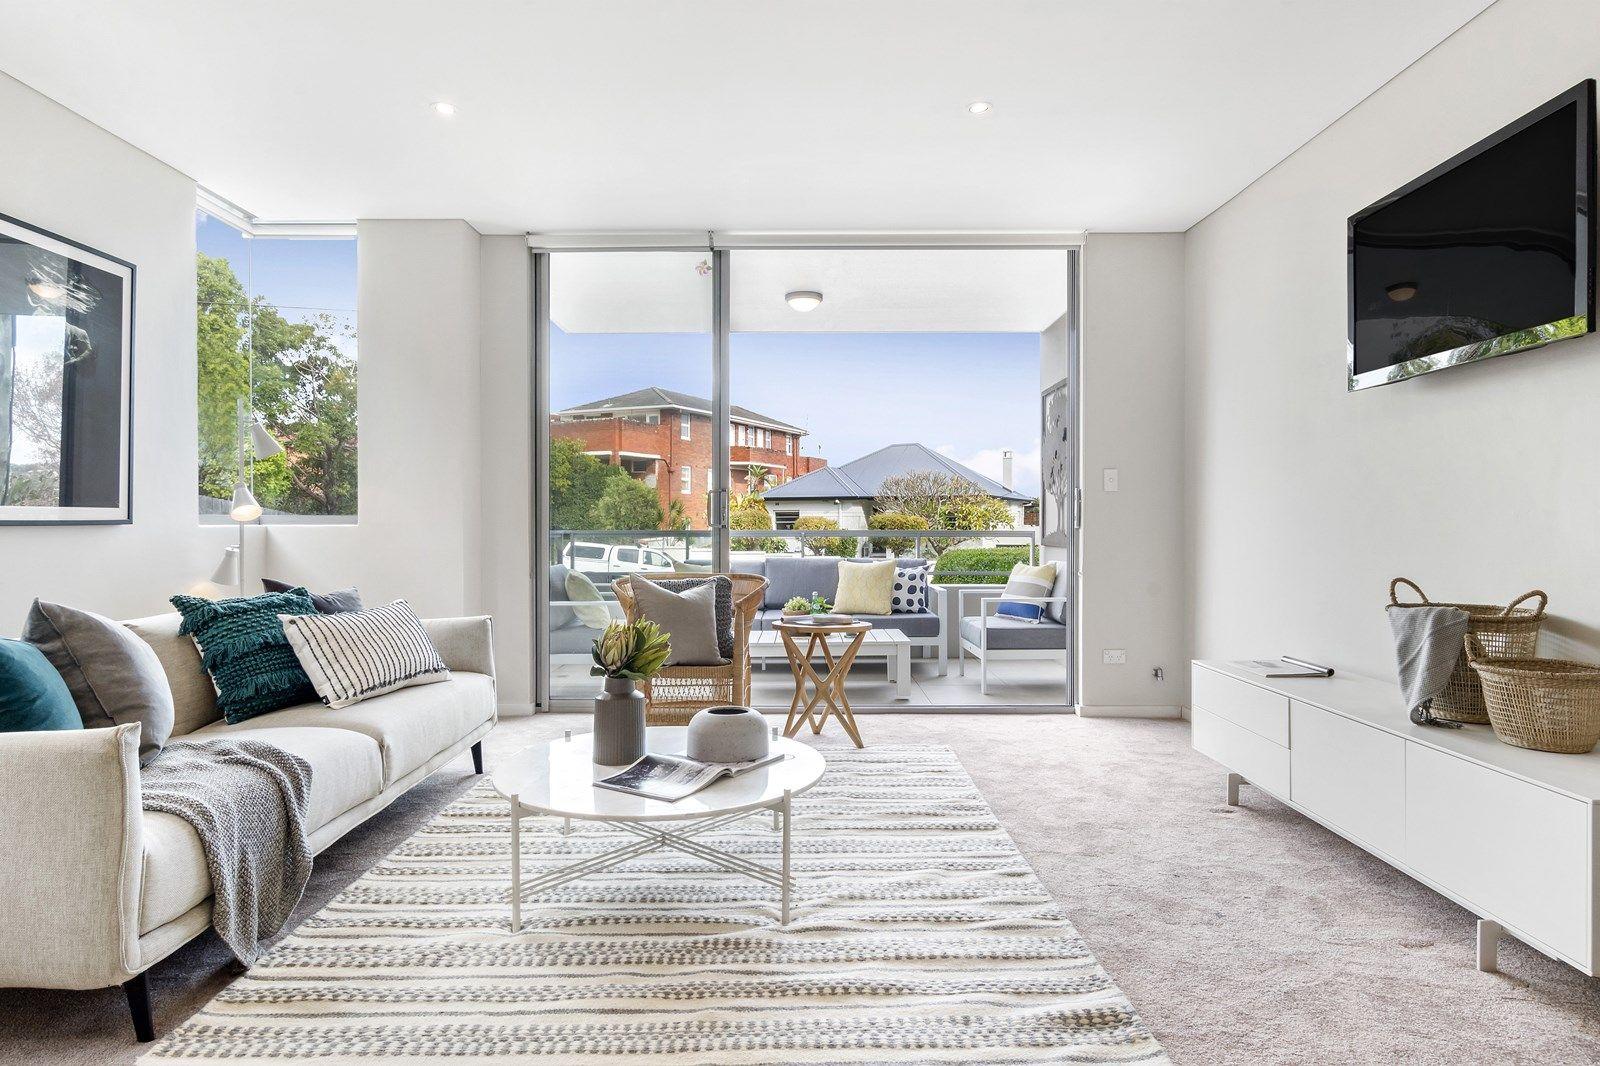 2/29 Dalley Street, Queenscliff NSW 2096, Image 1